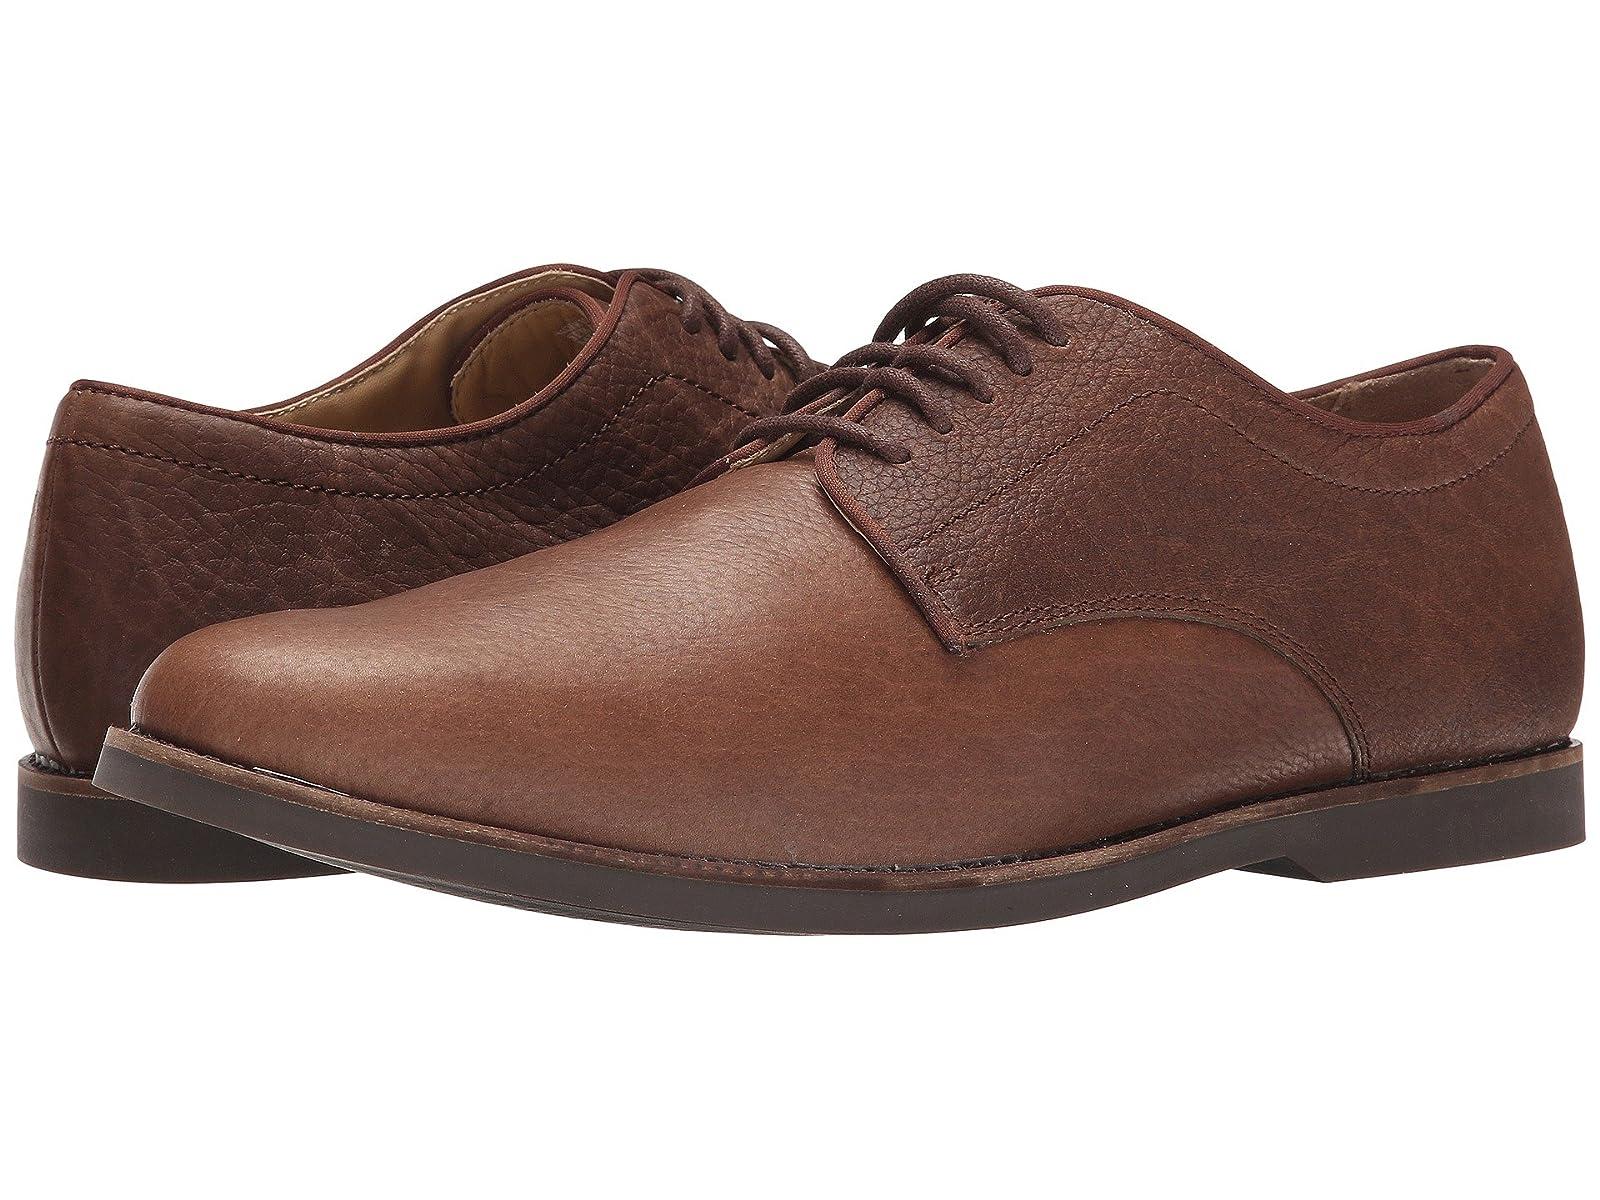 Sebago Norwich OxfordCheap and distinctive eye-catching shoes